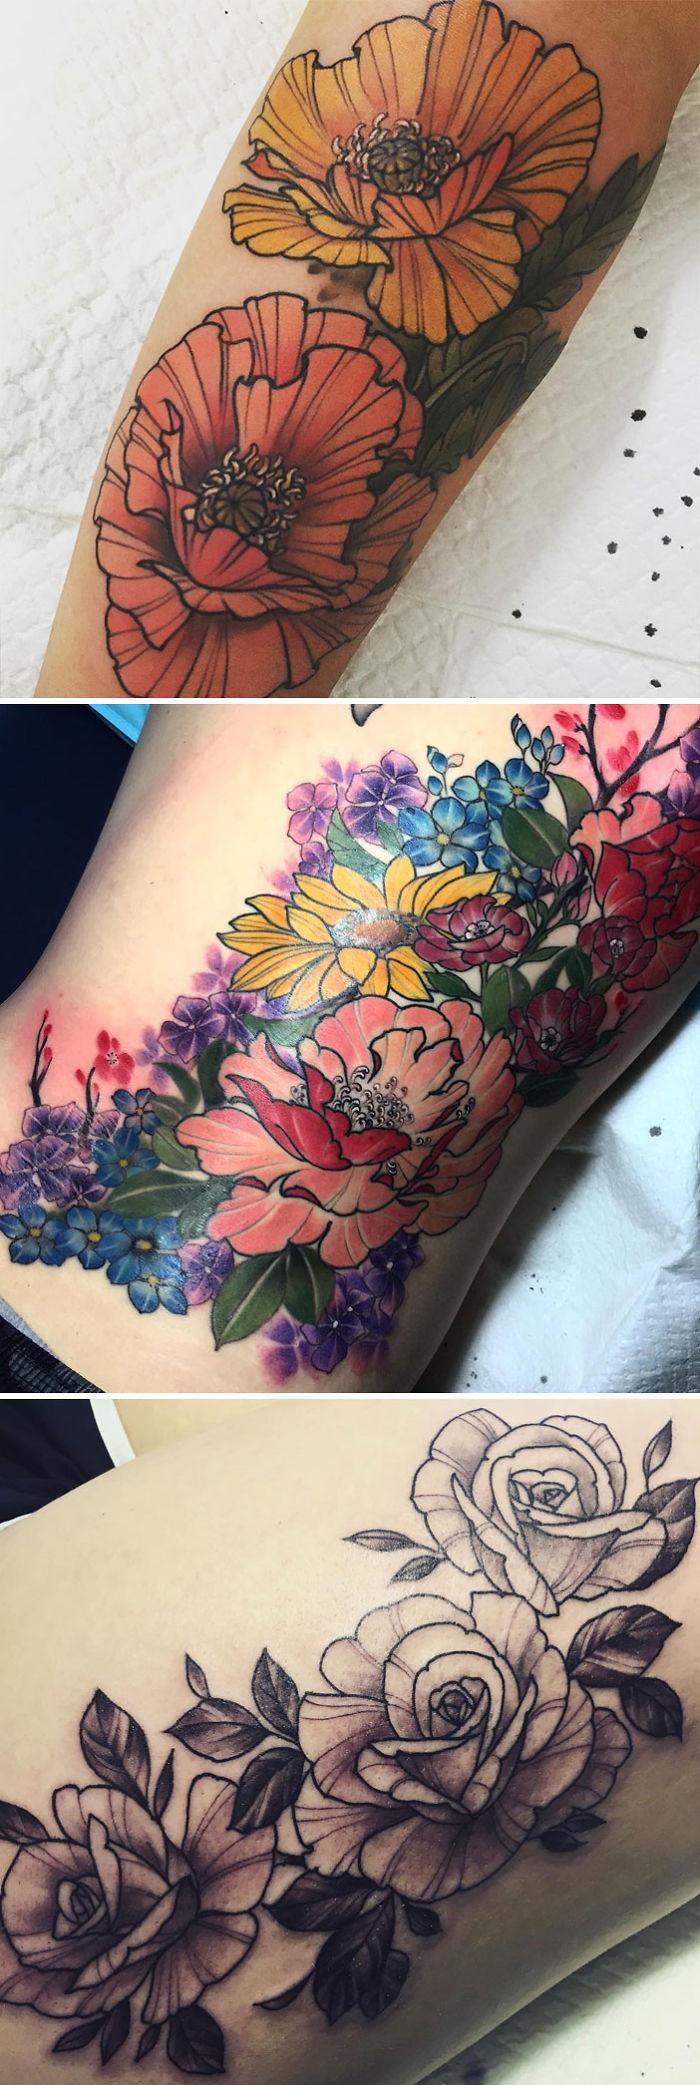 tatuagens-florais (23)